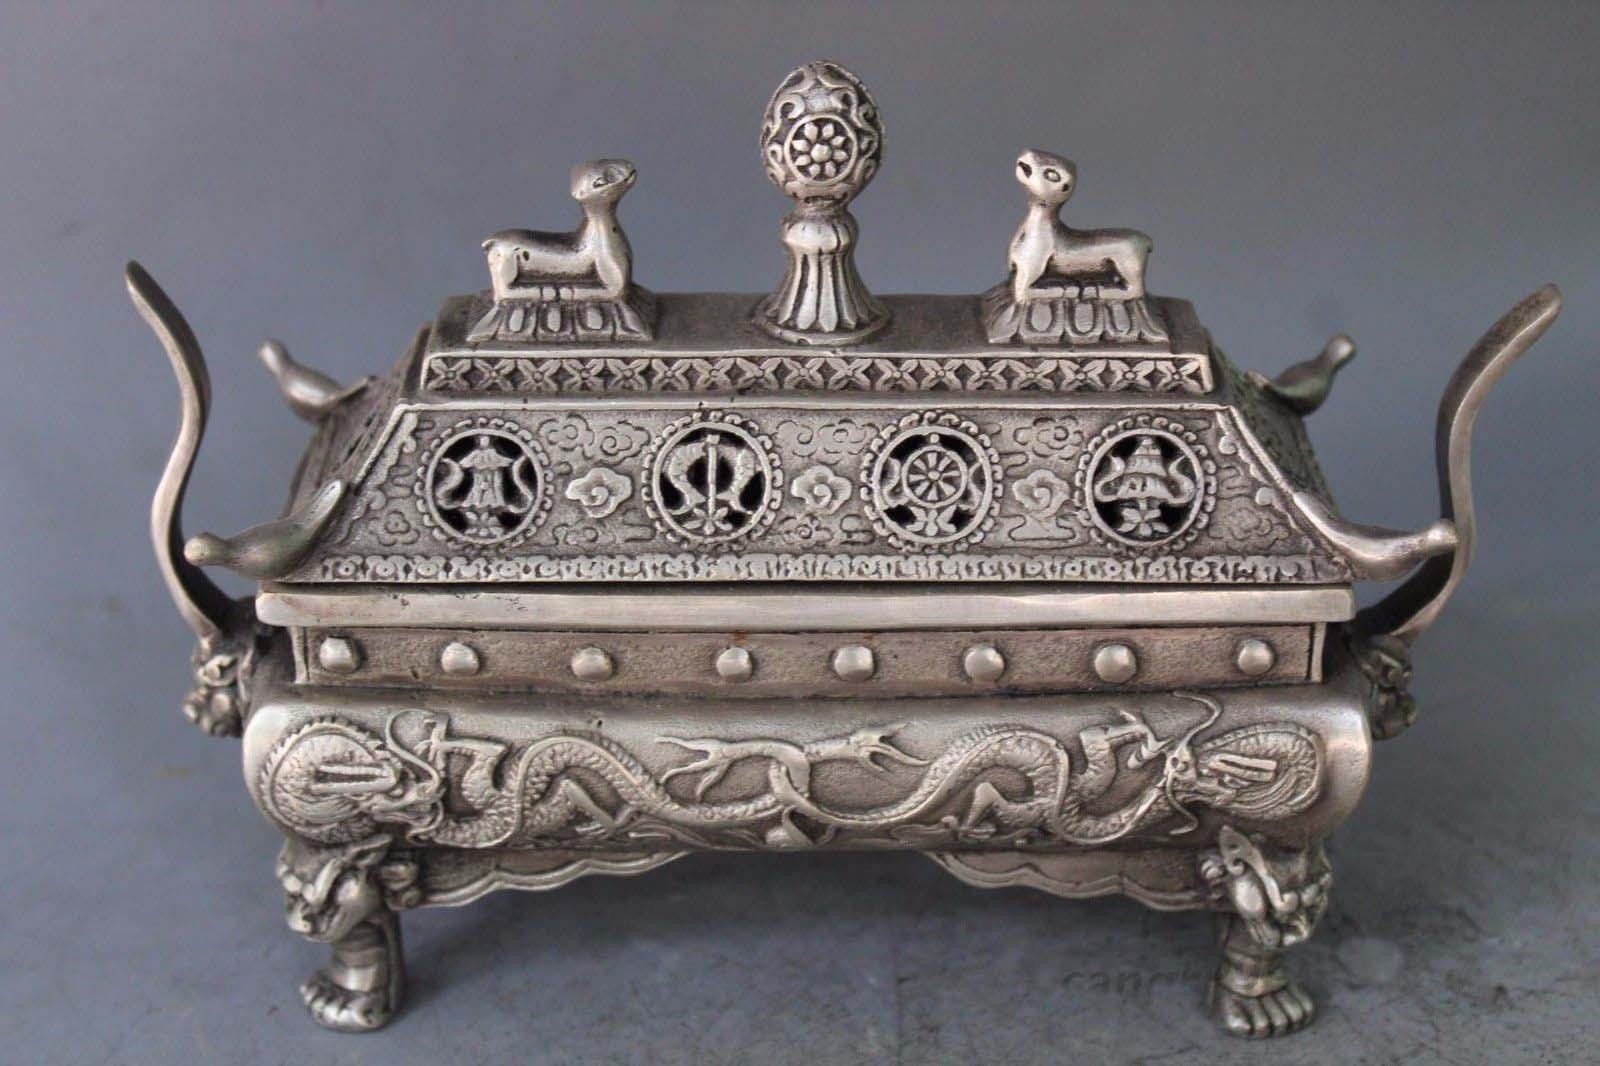 6Tibet buddhism silver Eight treasures Dragon Deer Bird incense burner Censer6Tibet buddhism silver Eight treasures Dragon Deer Bird incense burner Censer